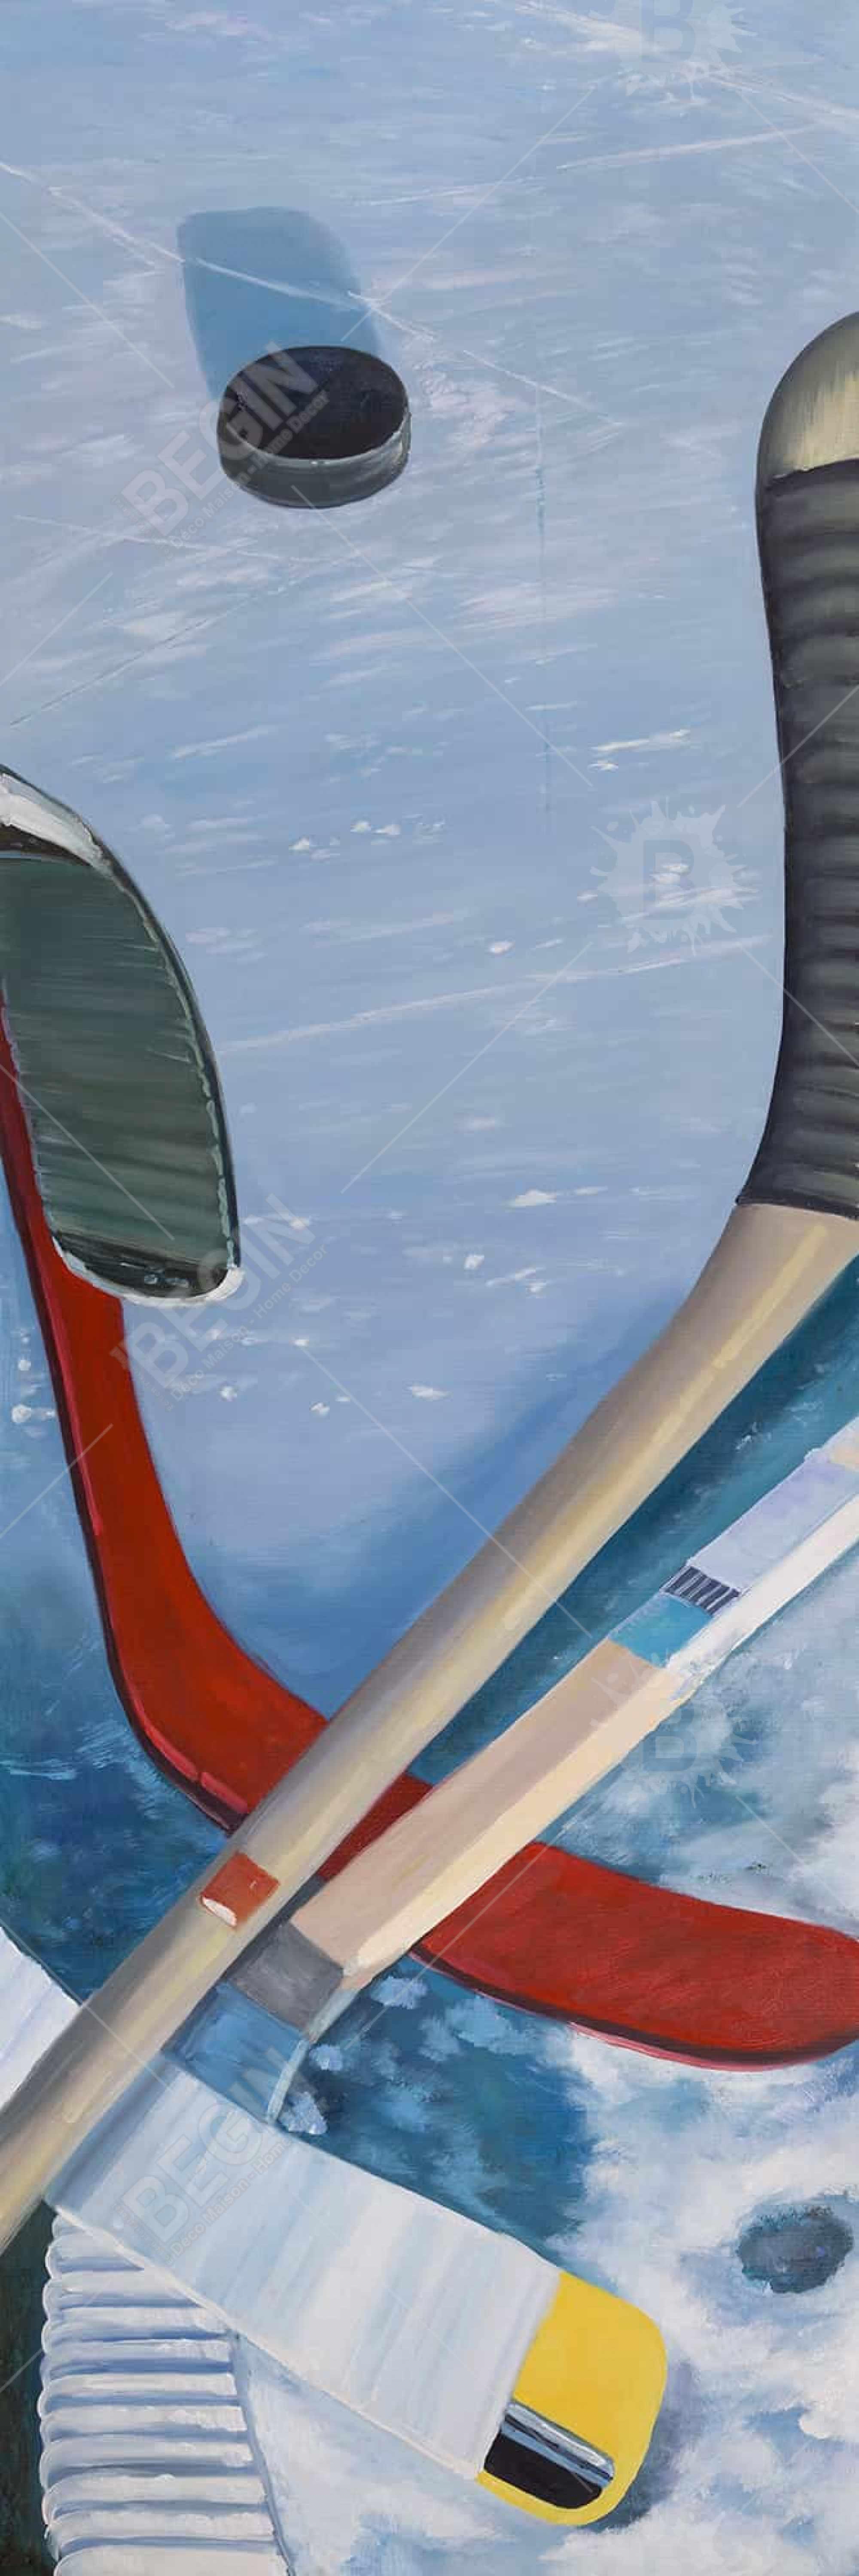 Hockey sticks on ice